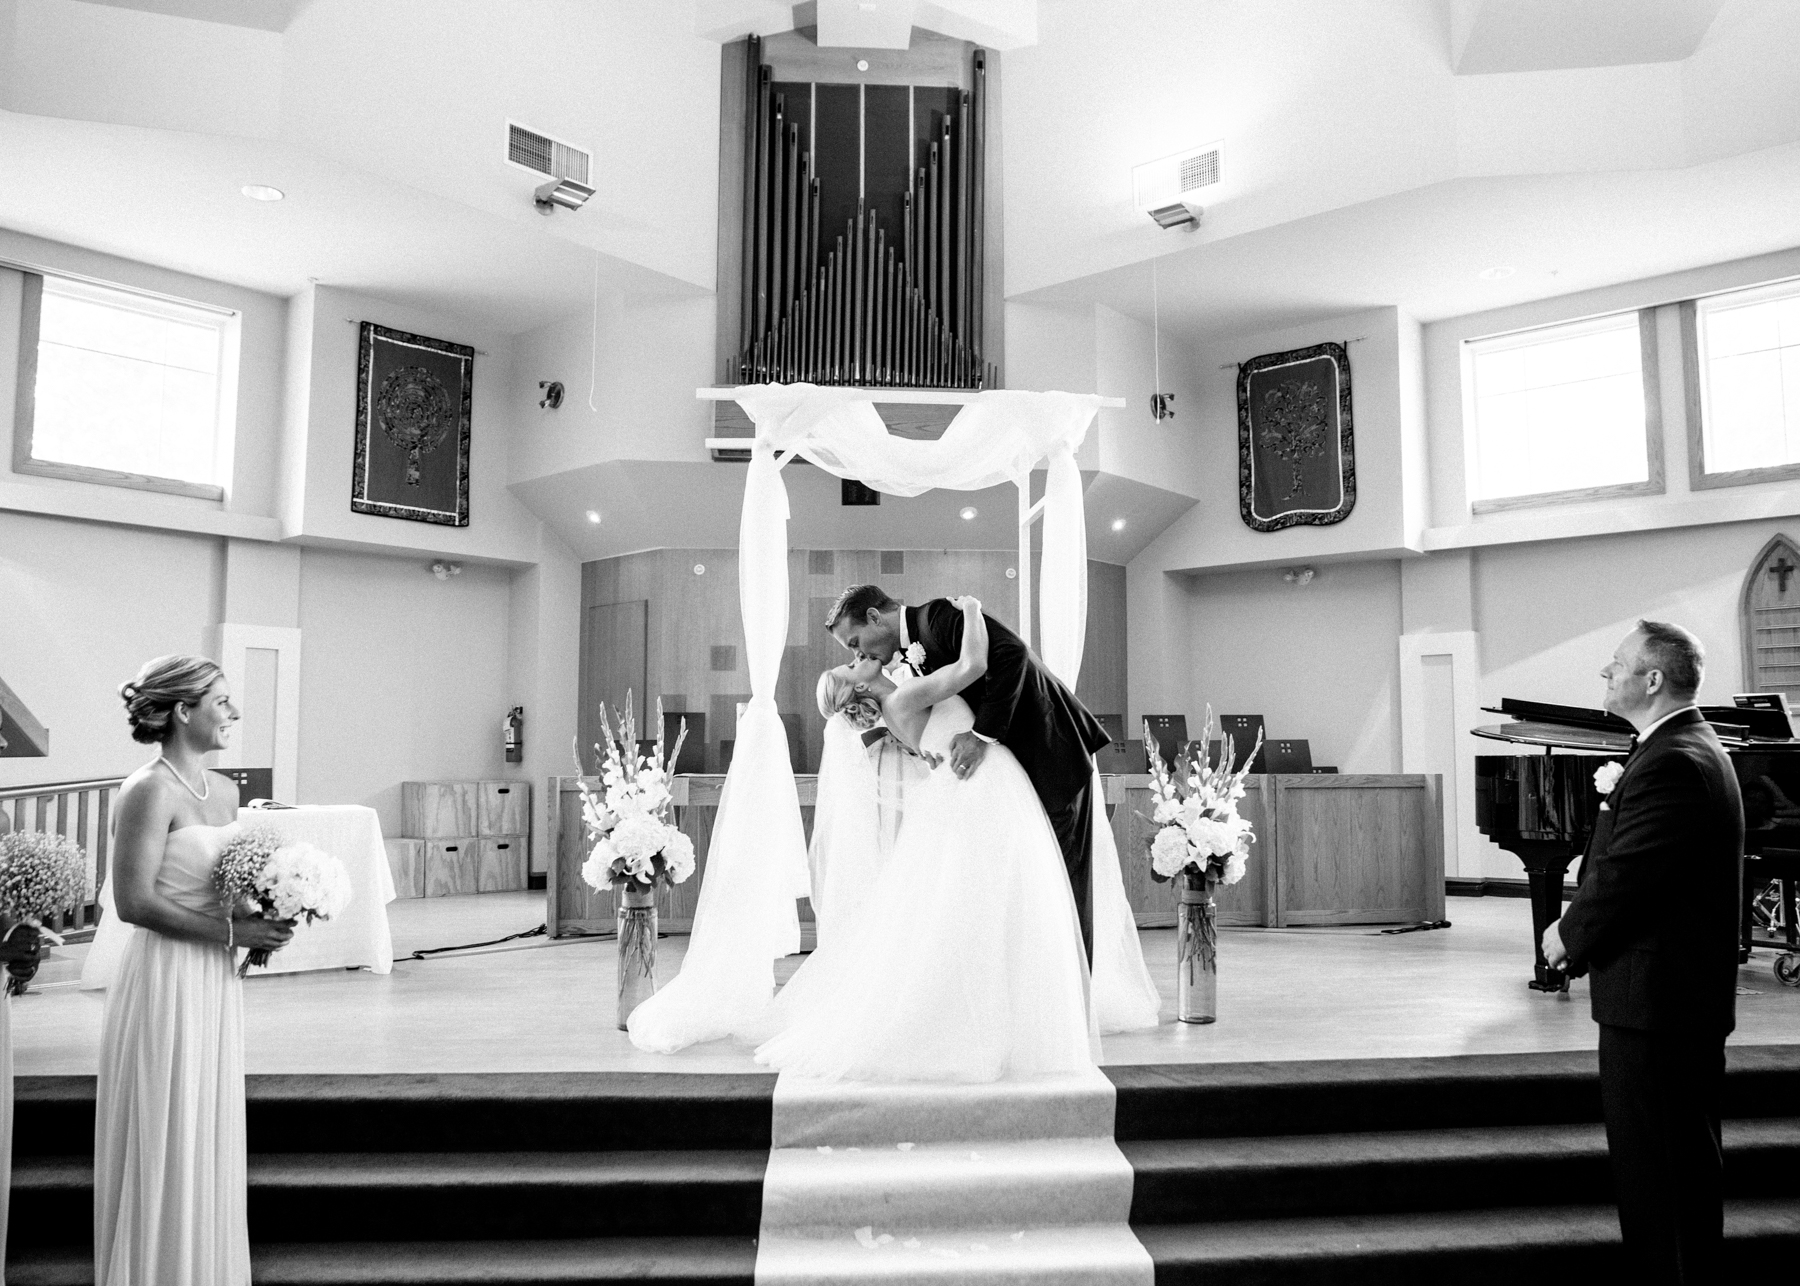 kaoverii_silva_photographer_via-herafilms_kelly_mike_wedding-11.jpg